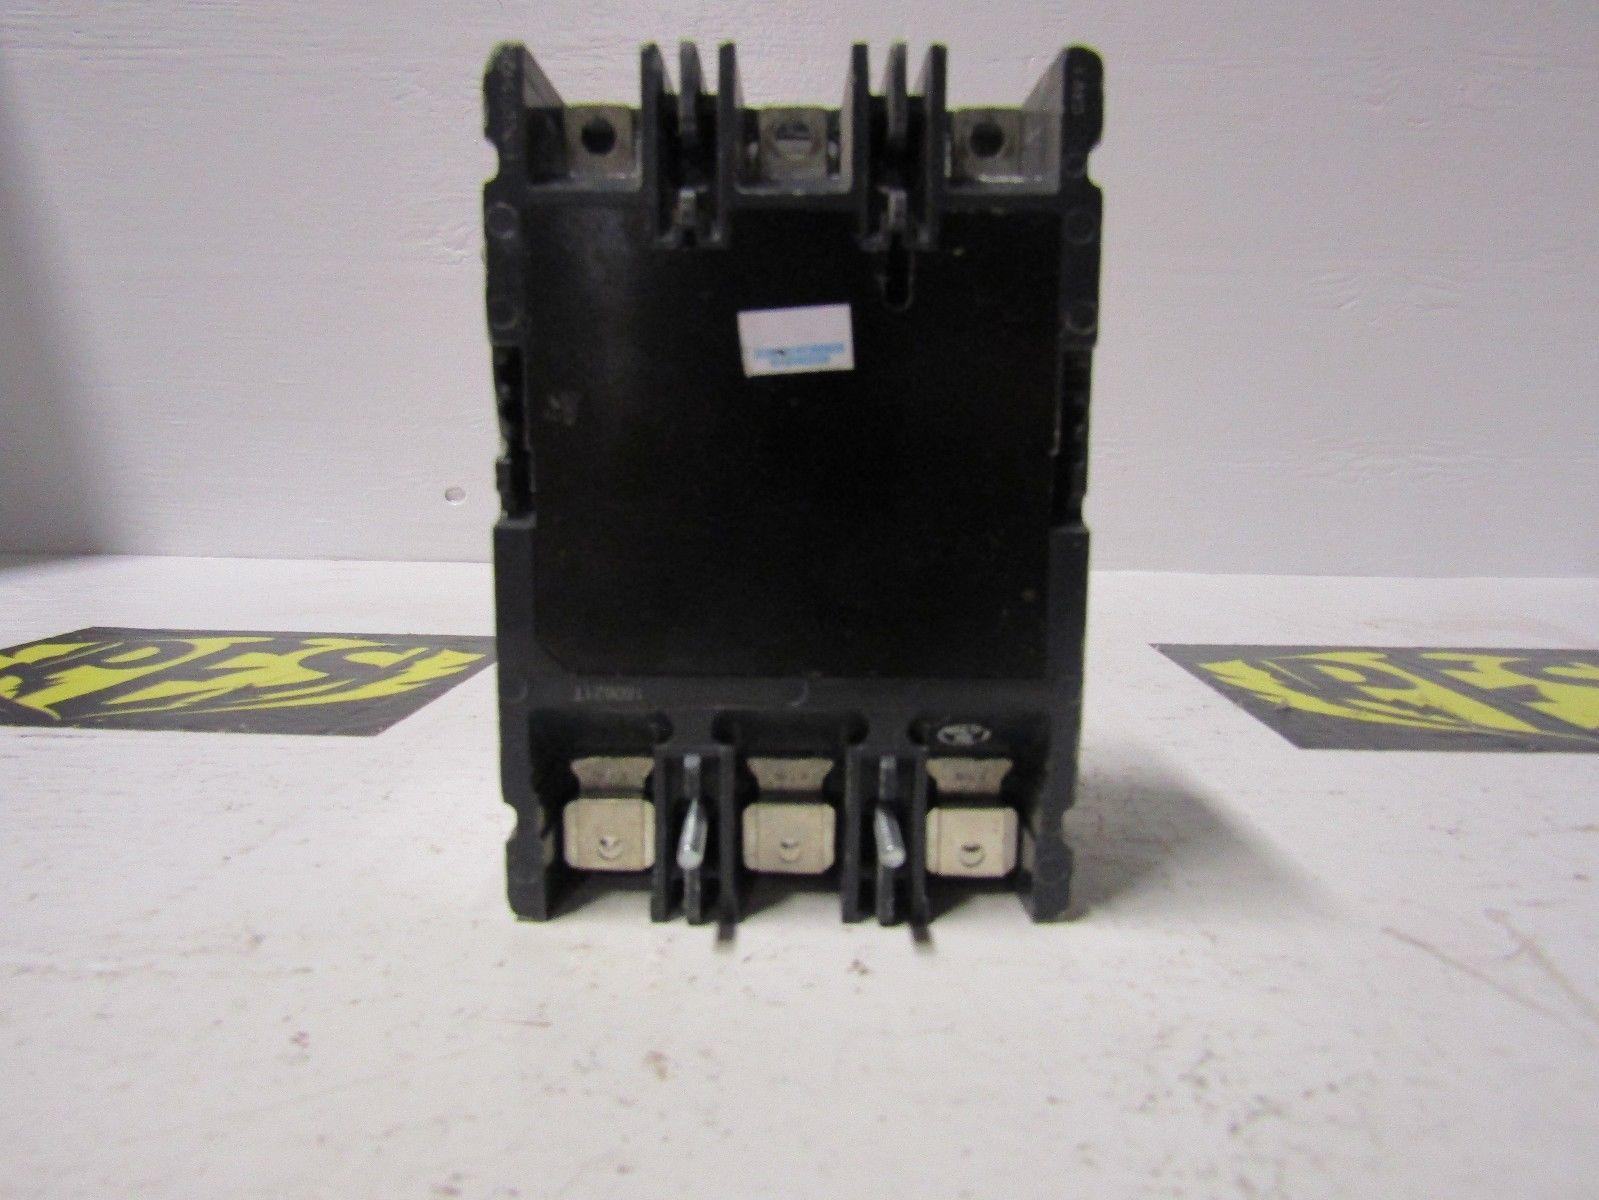 Eaton Cutler Hammer Ed3200bp10 3pl 3ph 200 Amp 240 V 65ka240 200amp Main Circuit Breaker With 60amp Generator